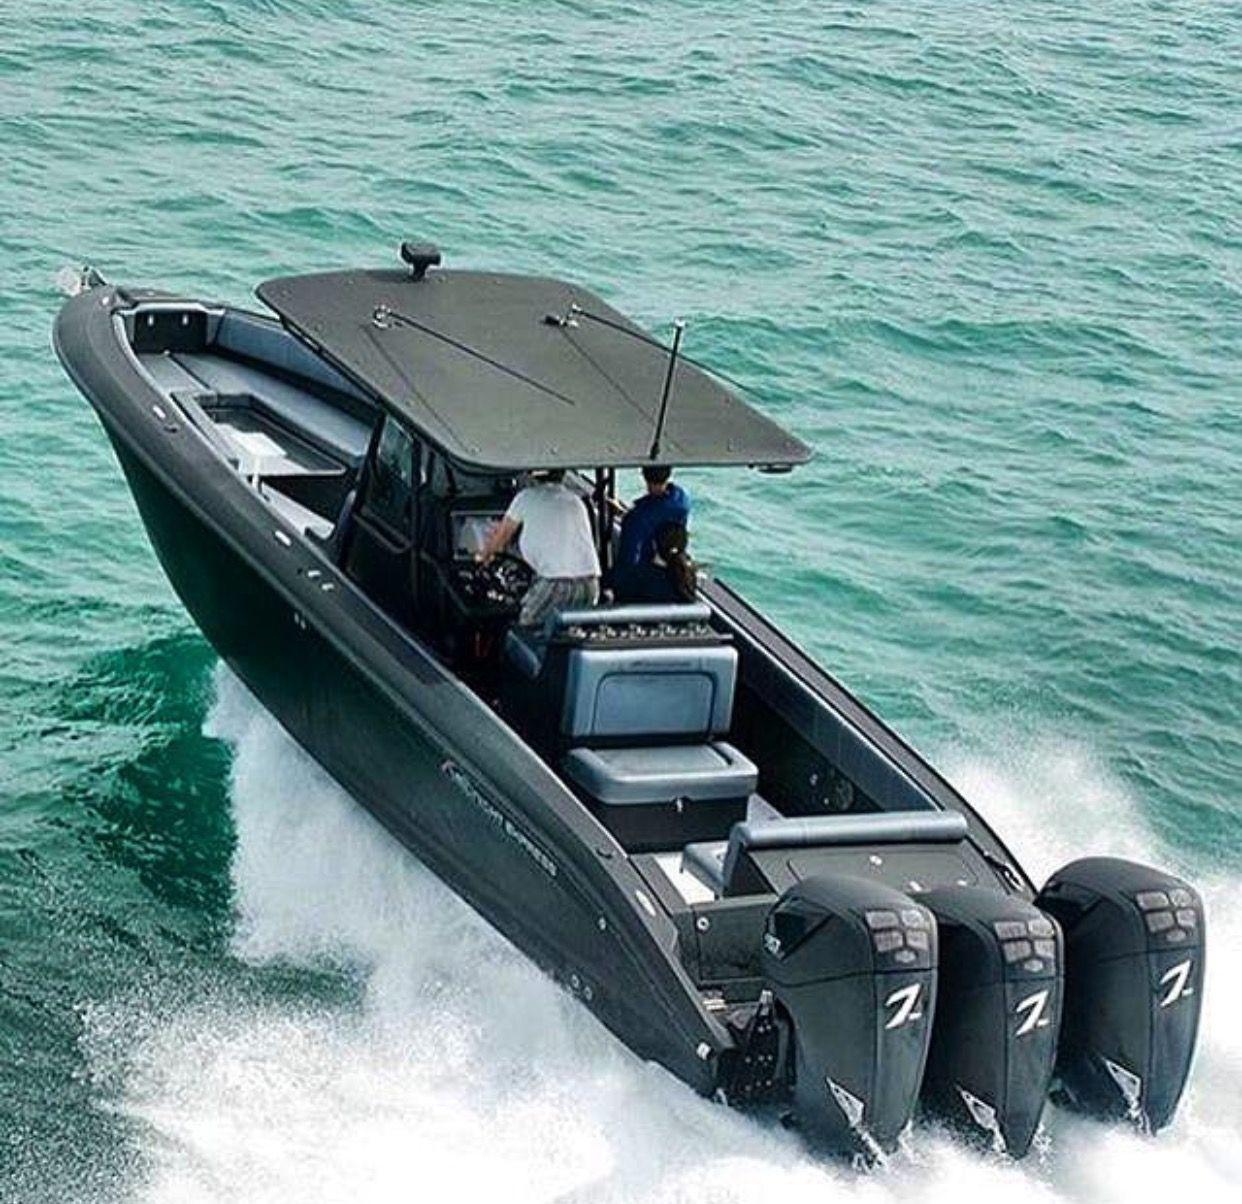 Pin by Joshua J. Cadwell on Watercraft. Power boats